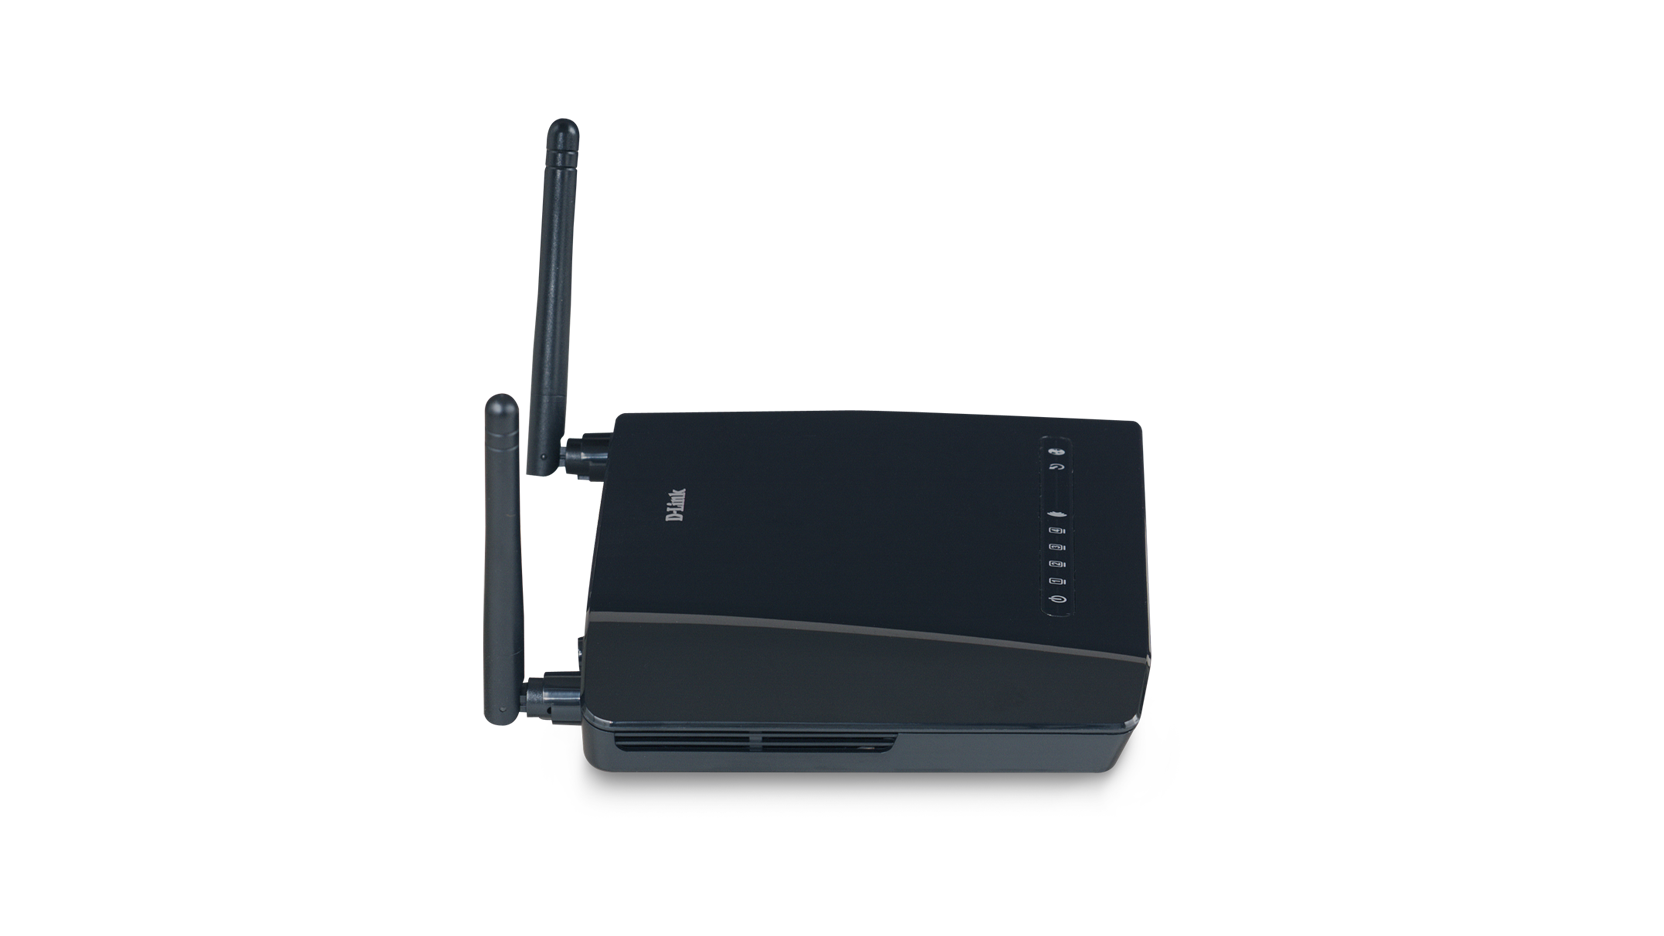 DSL 2740B Wireless N300 ADSL2+ Modem